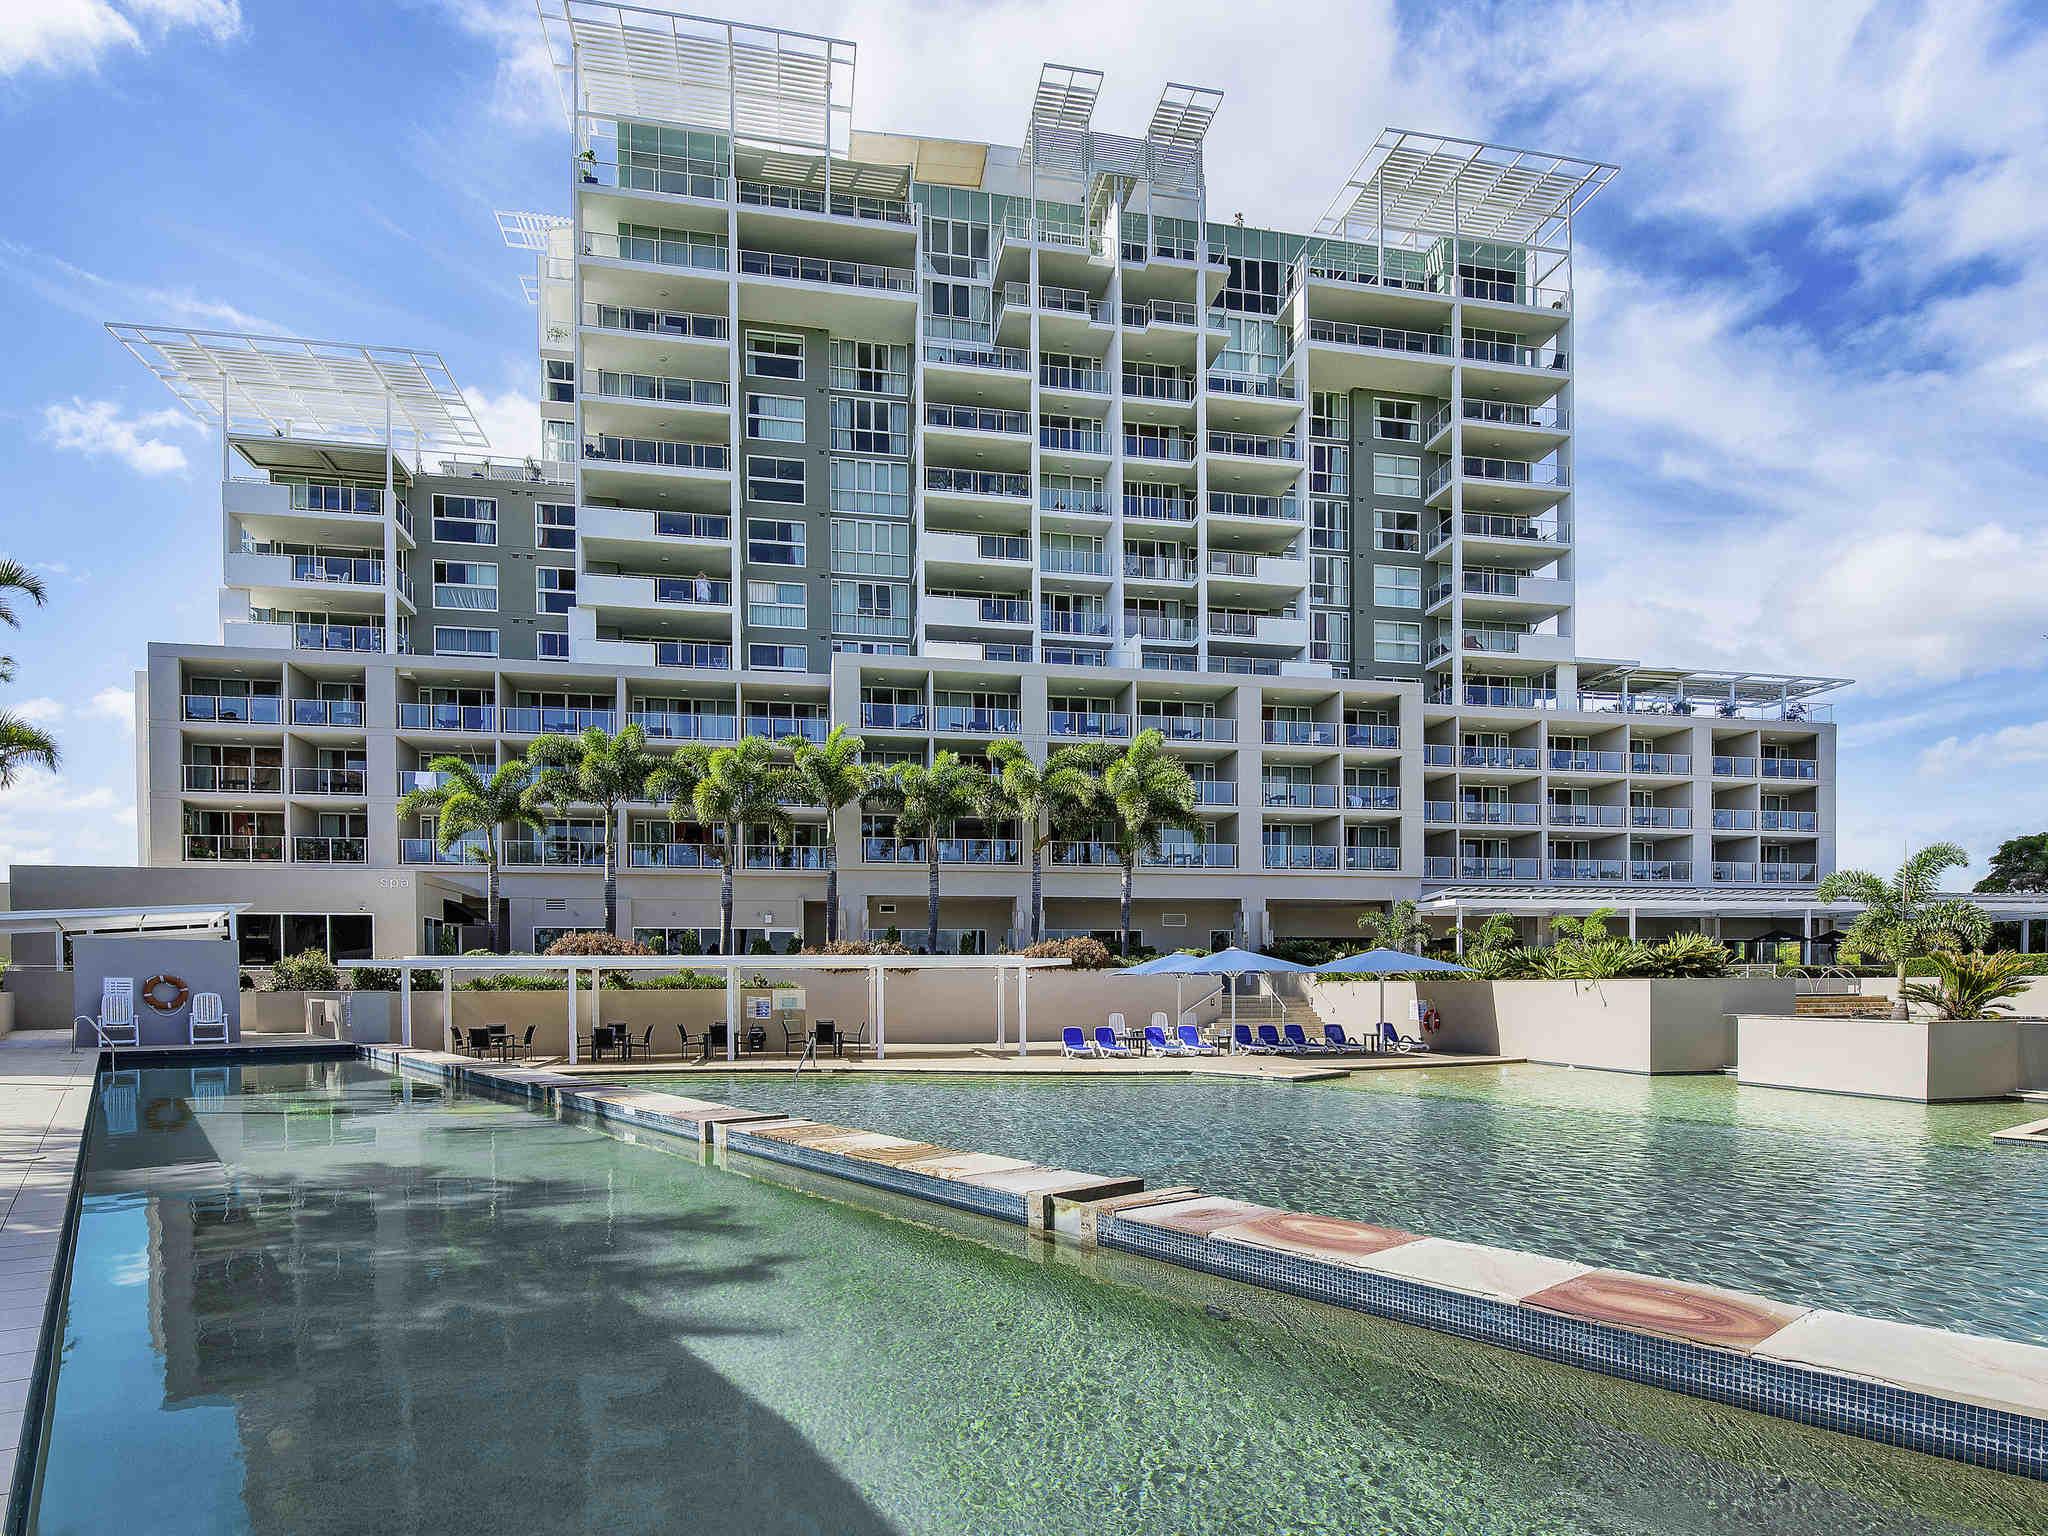 Otel – The Sebel Pelican Waters Resort